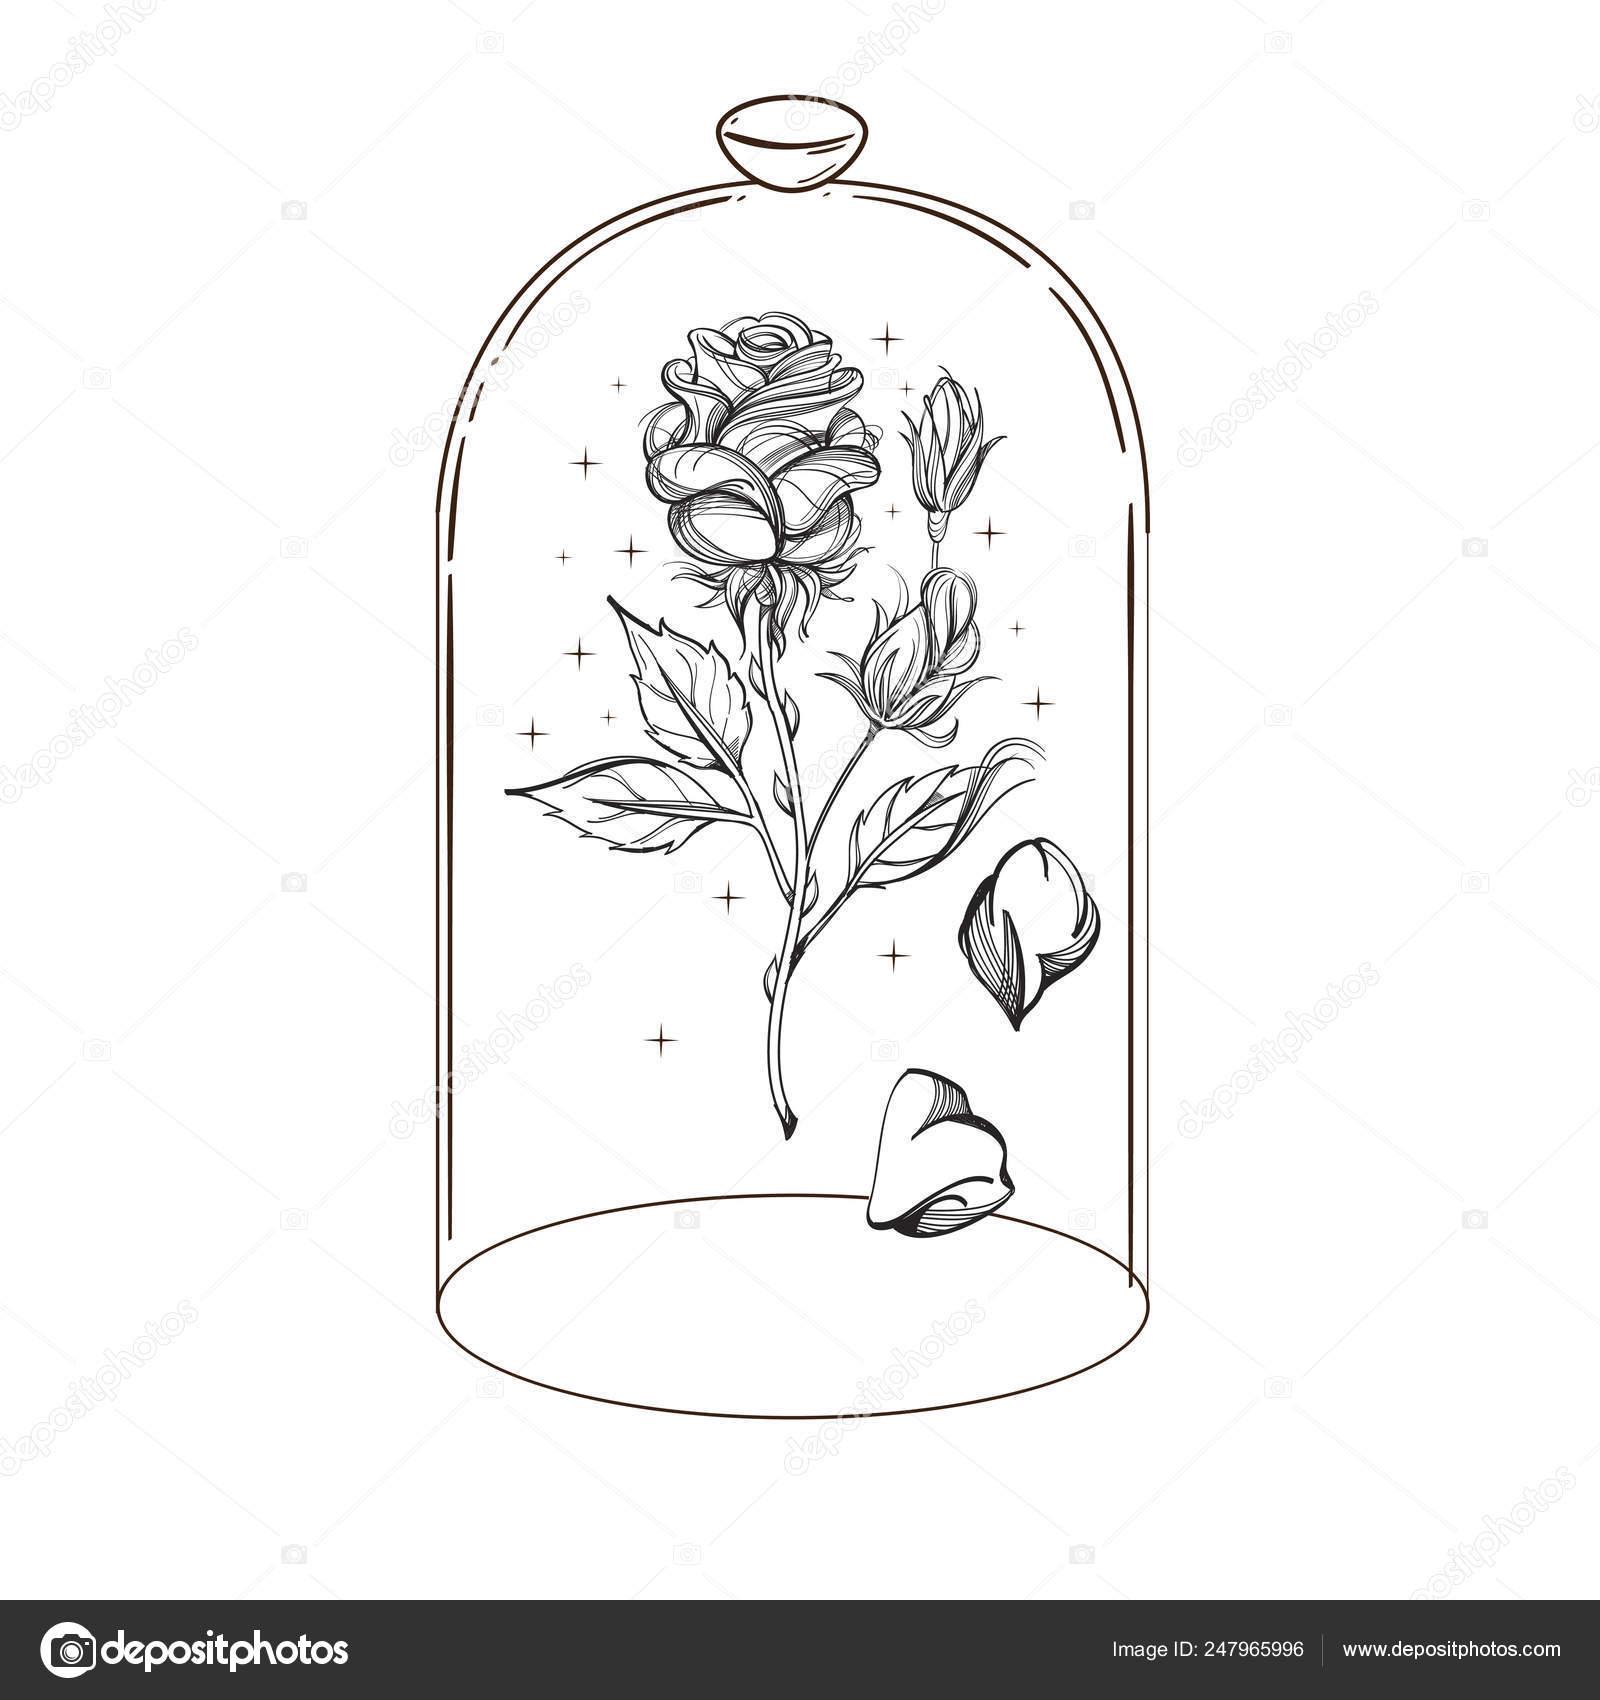 Картинки для срисовки роза в колбе